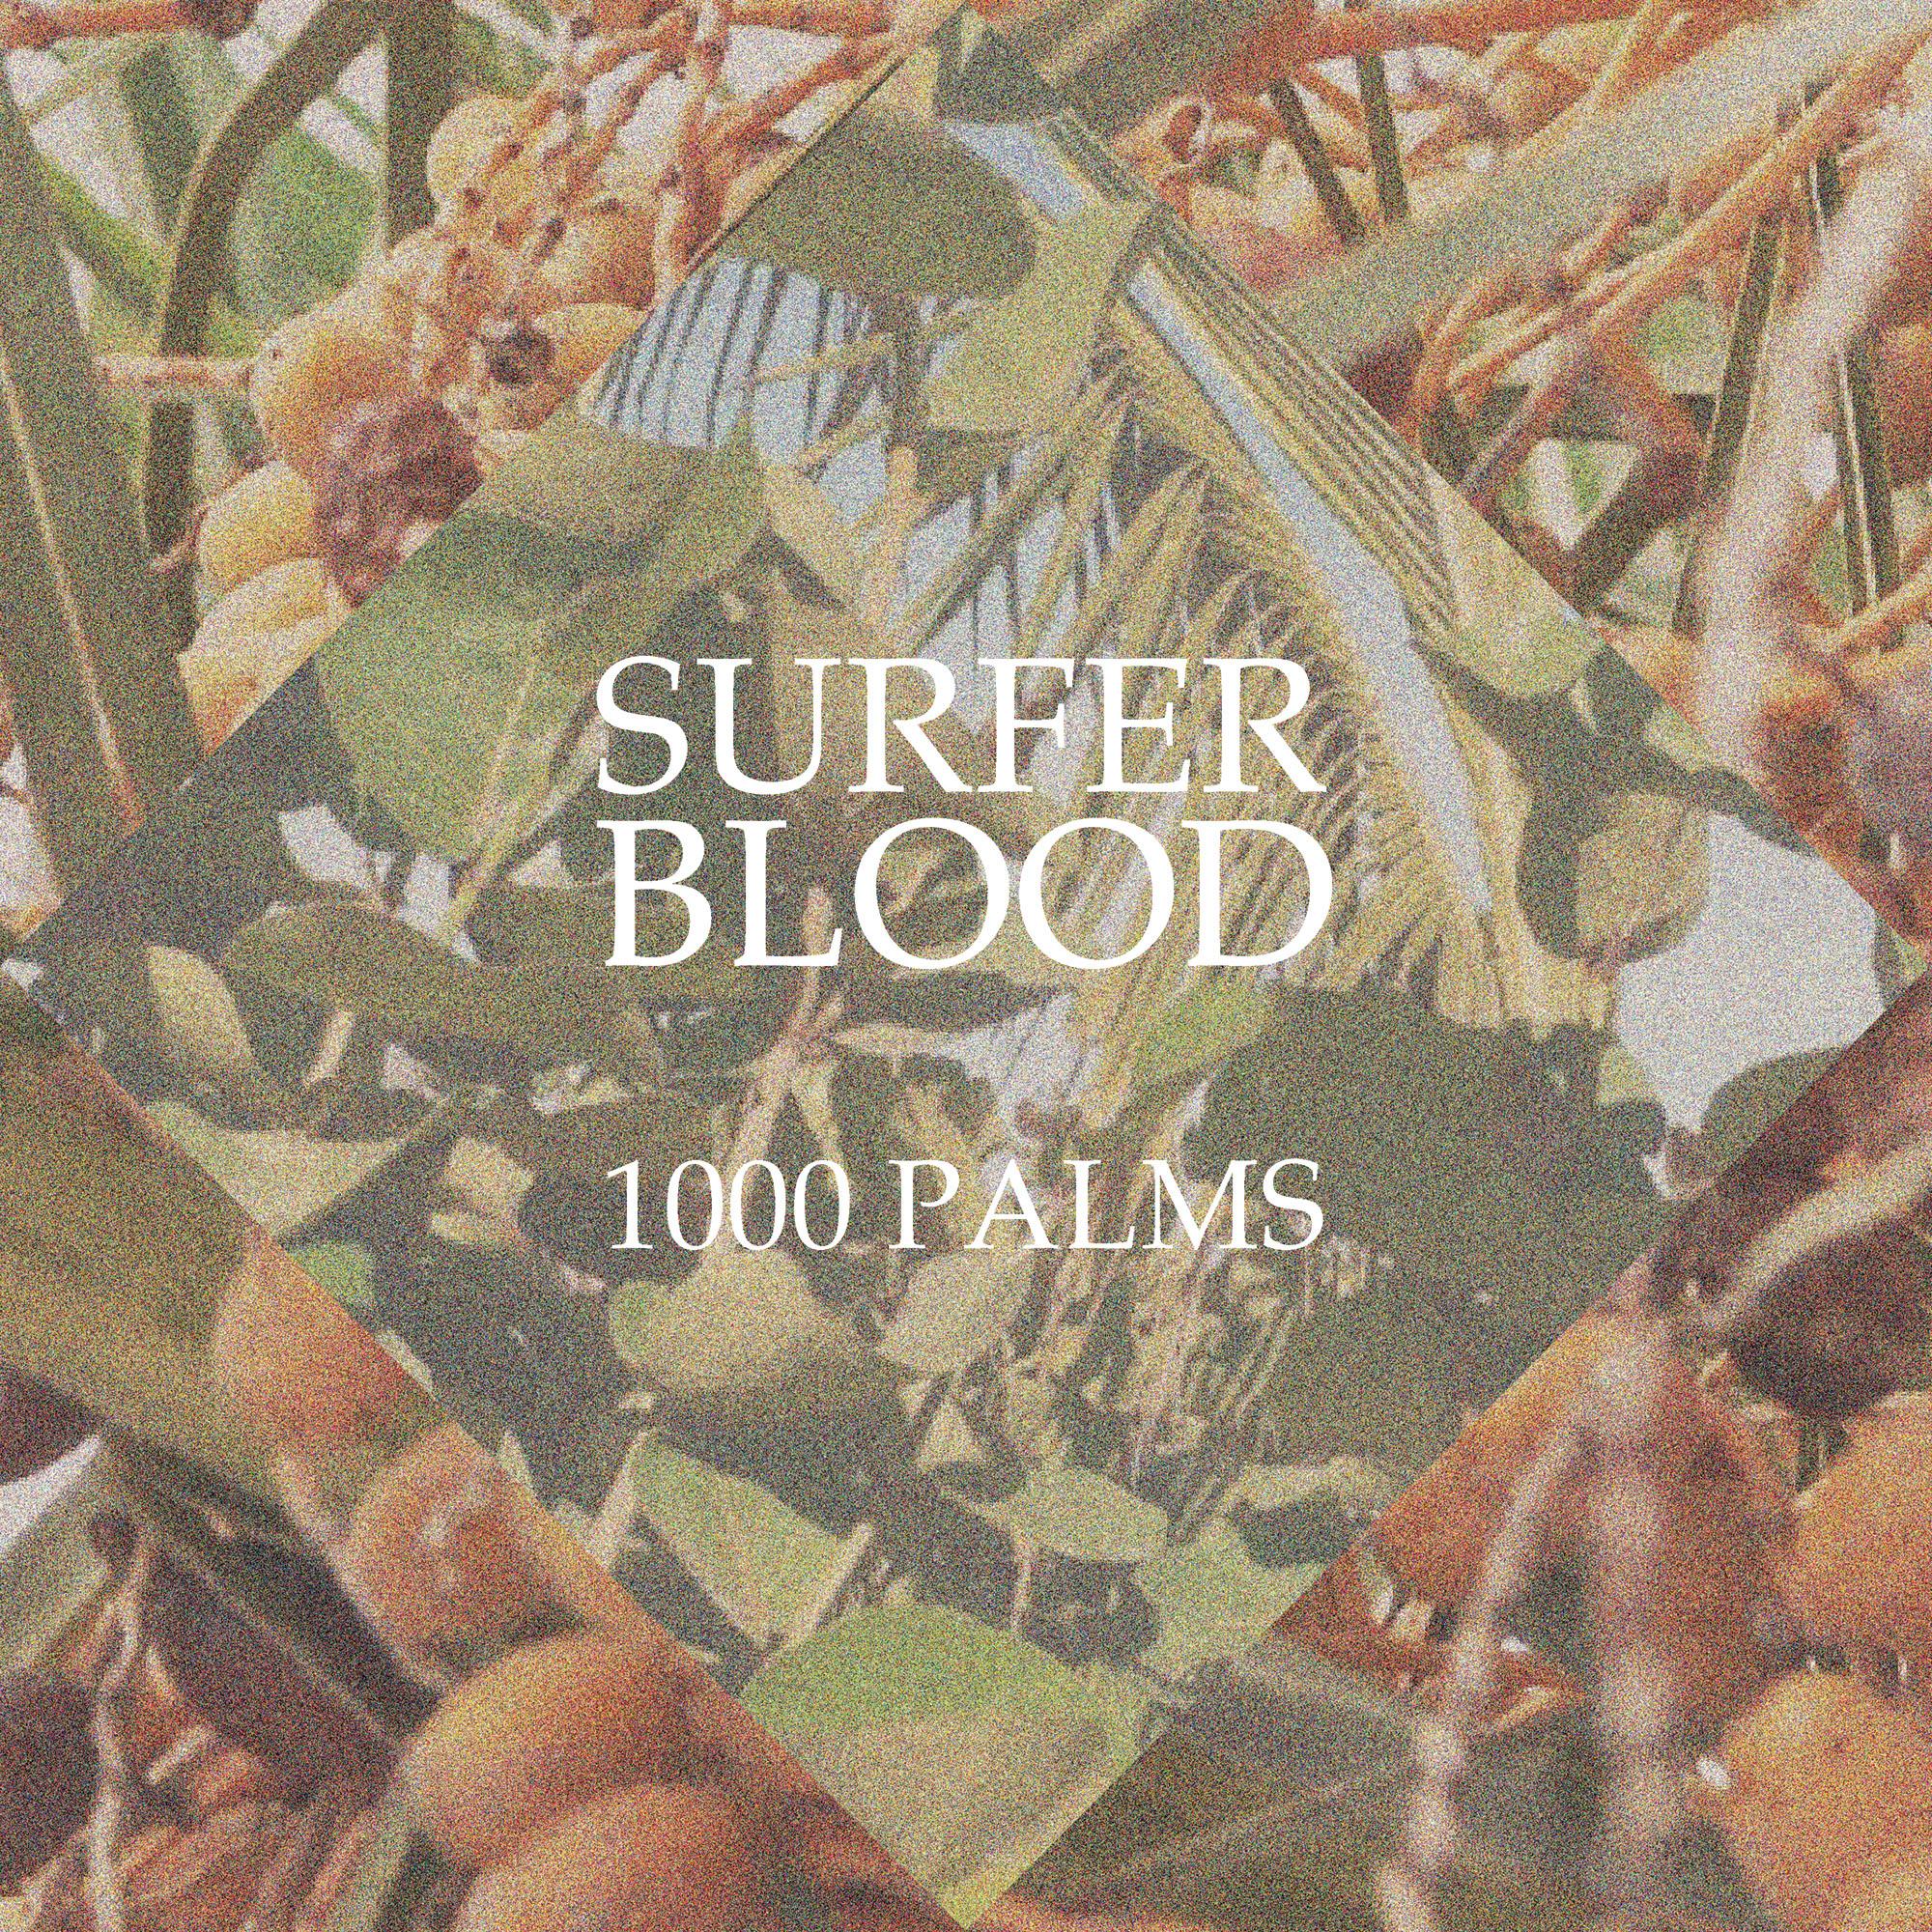 Surfer Blood – 1000 Palms